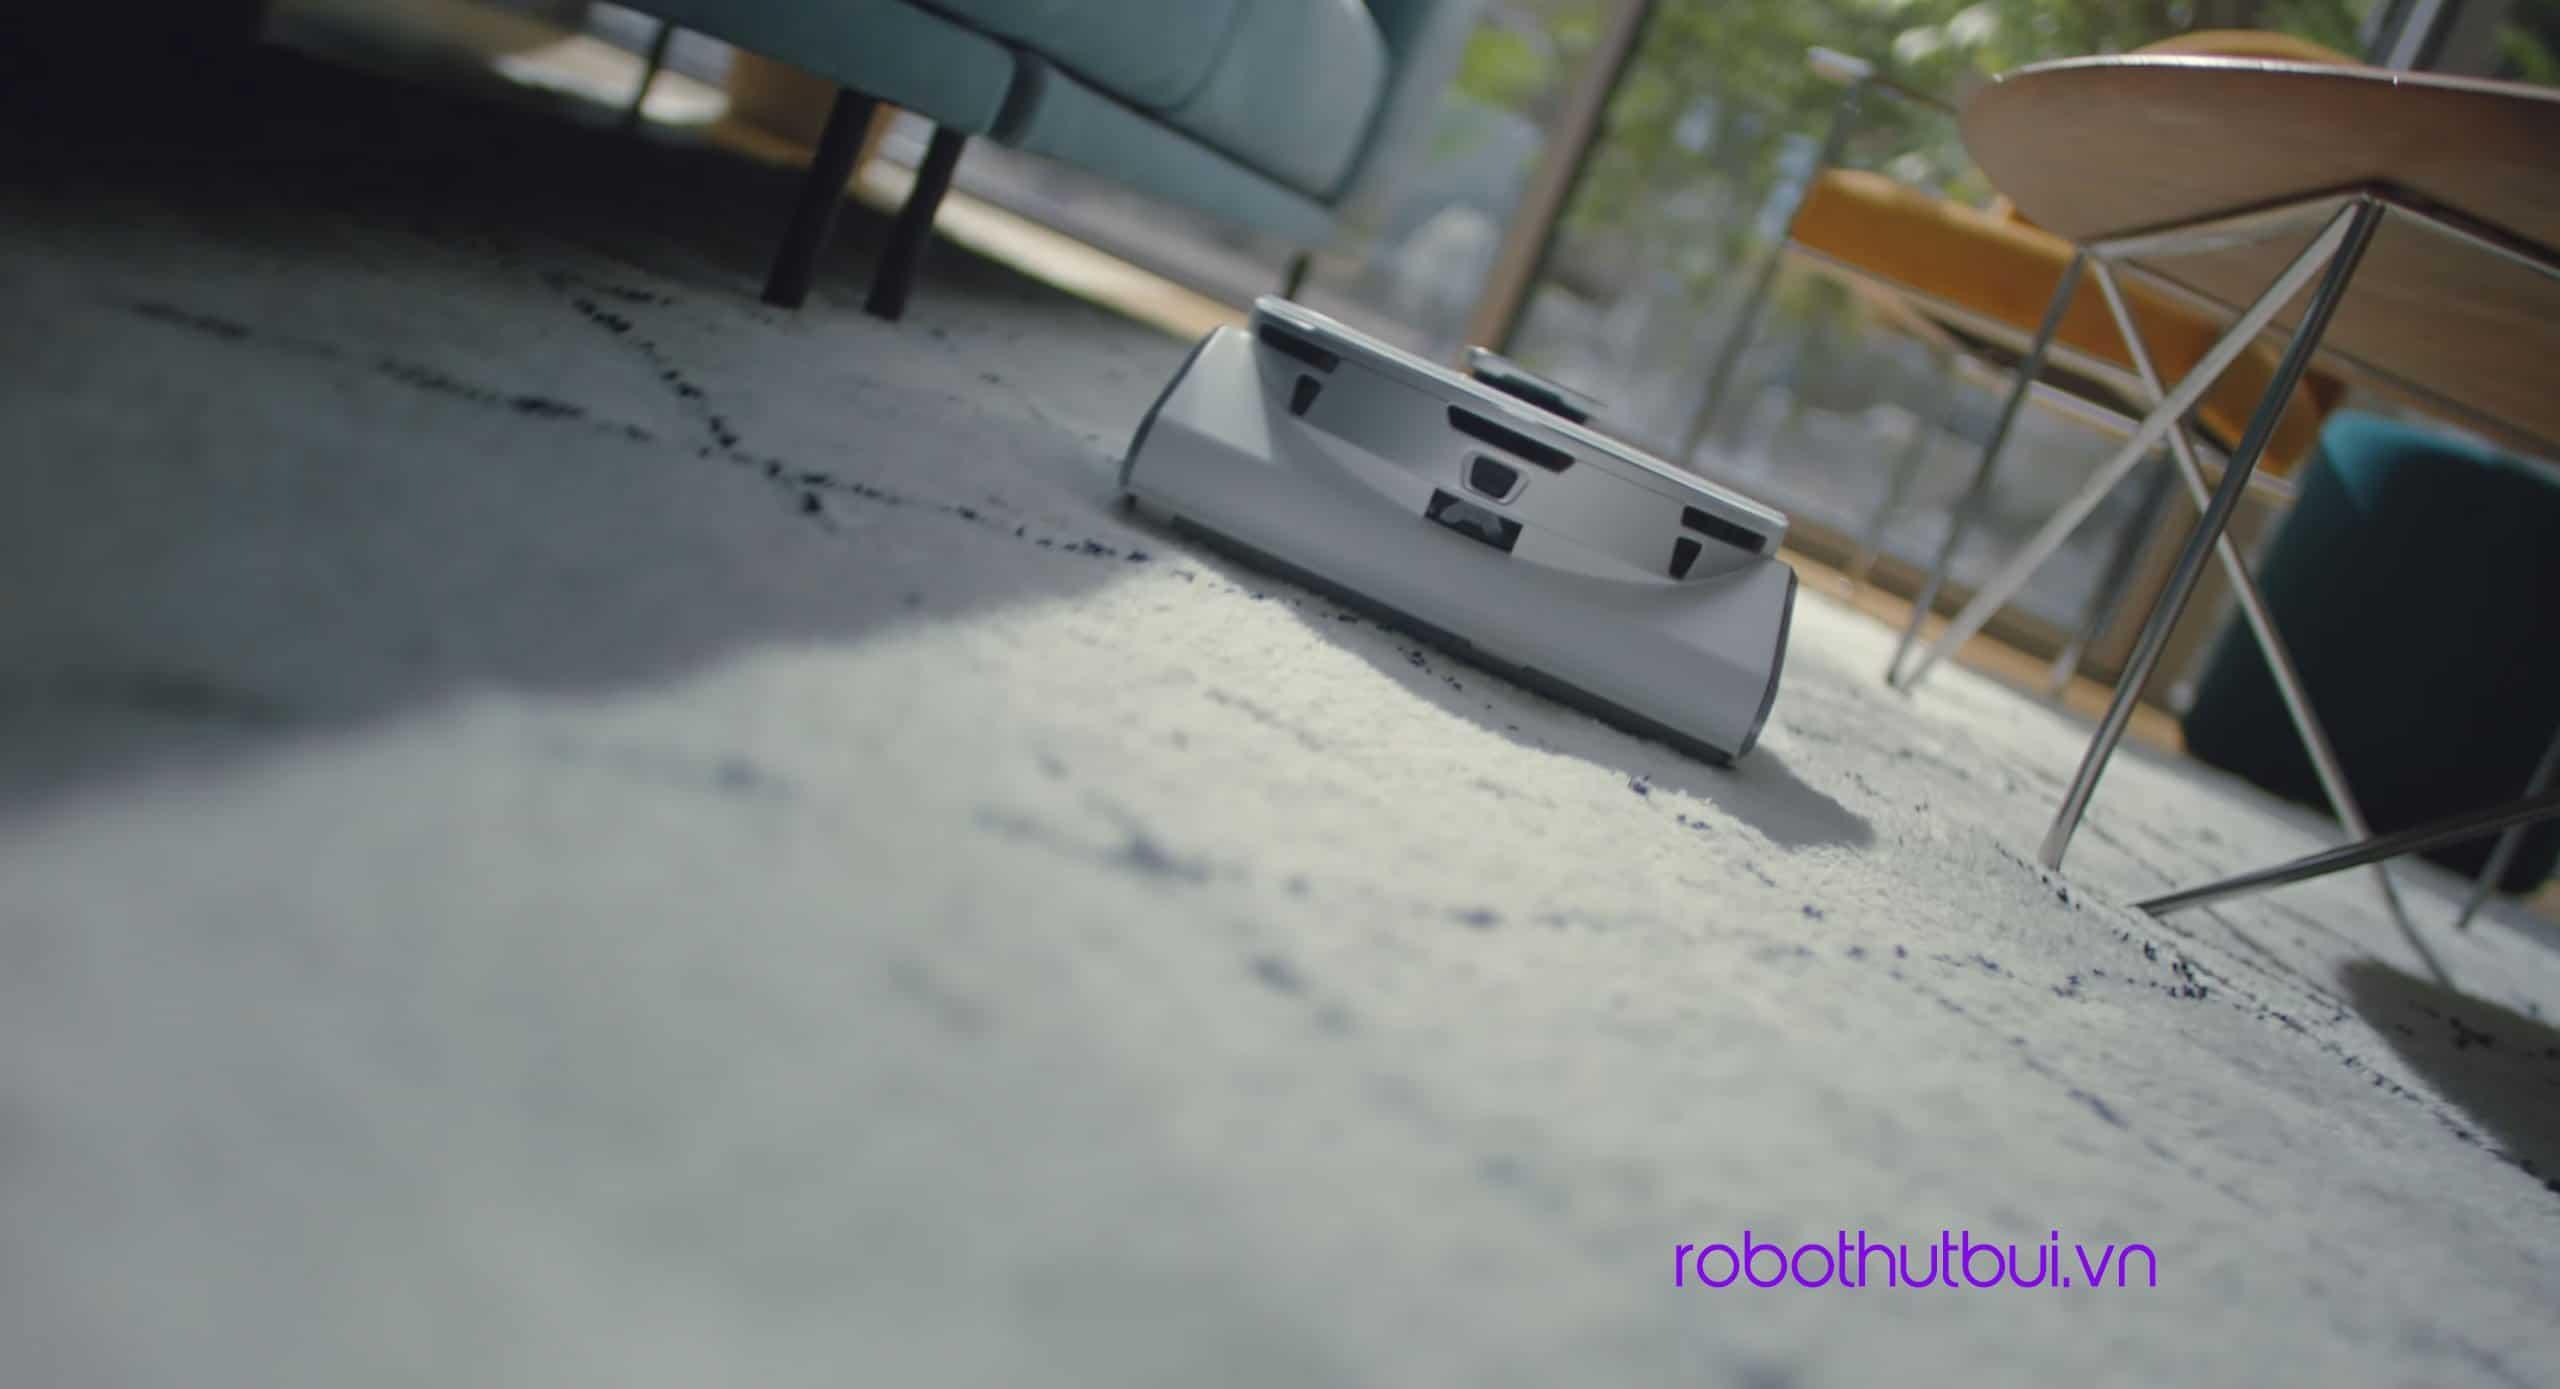 Samsung JetBot 90 AI+